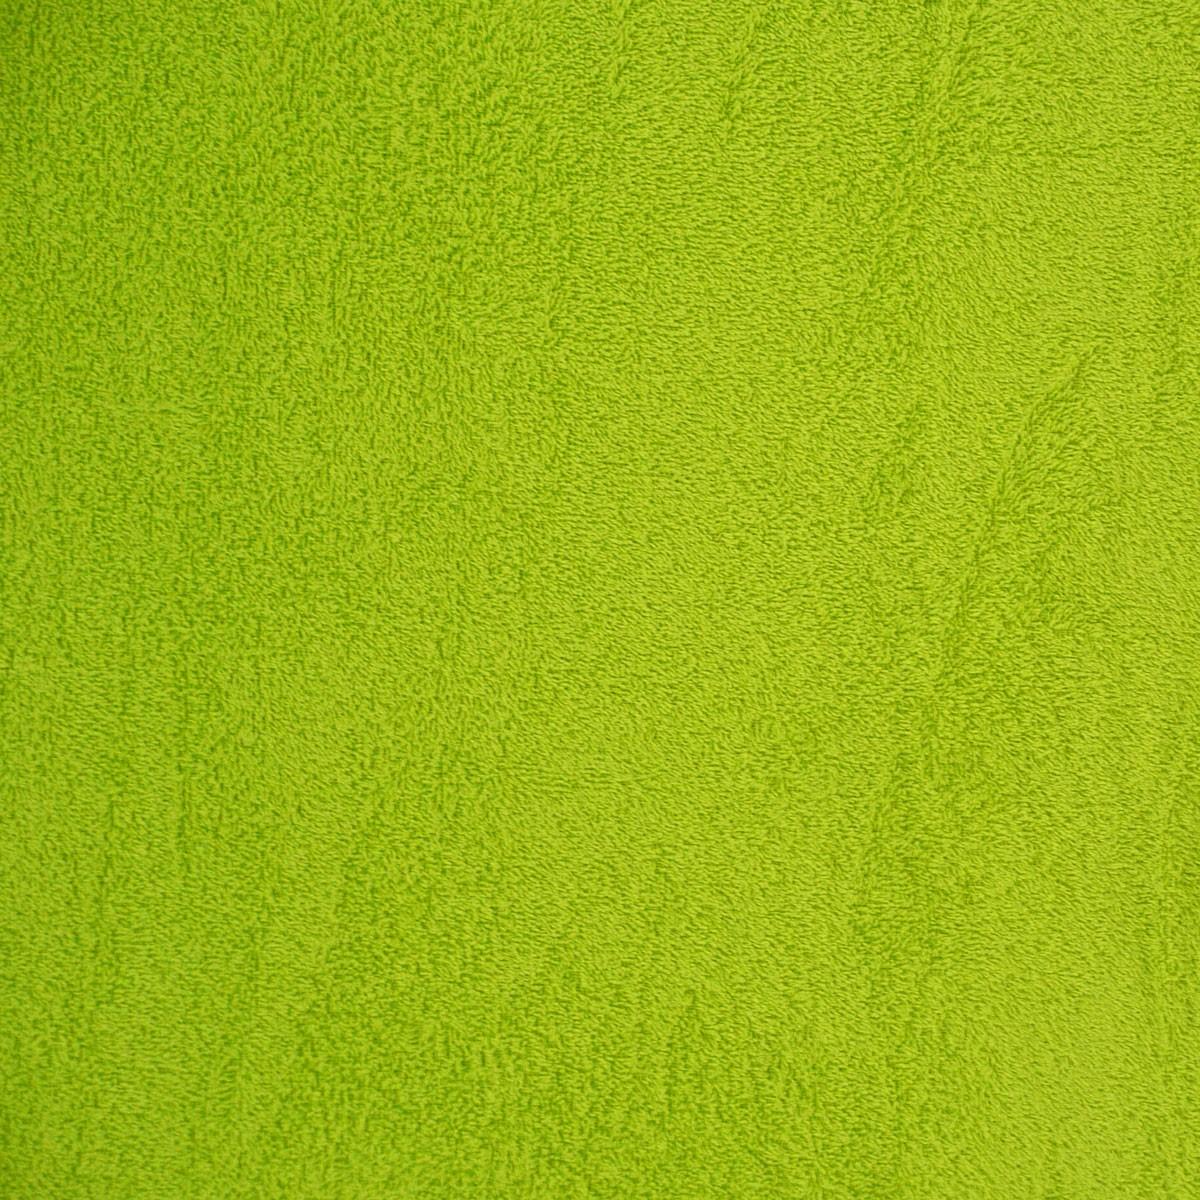 Frottee Handtuch Stoff apfelgrün